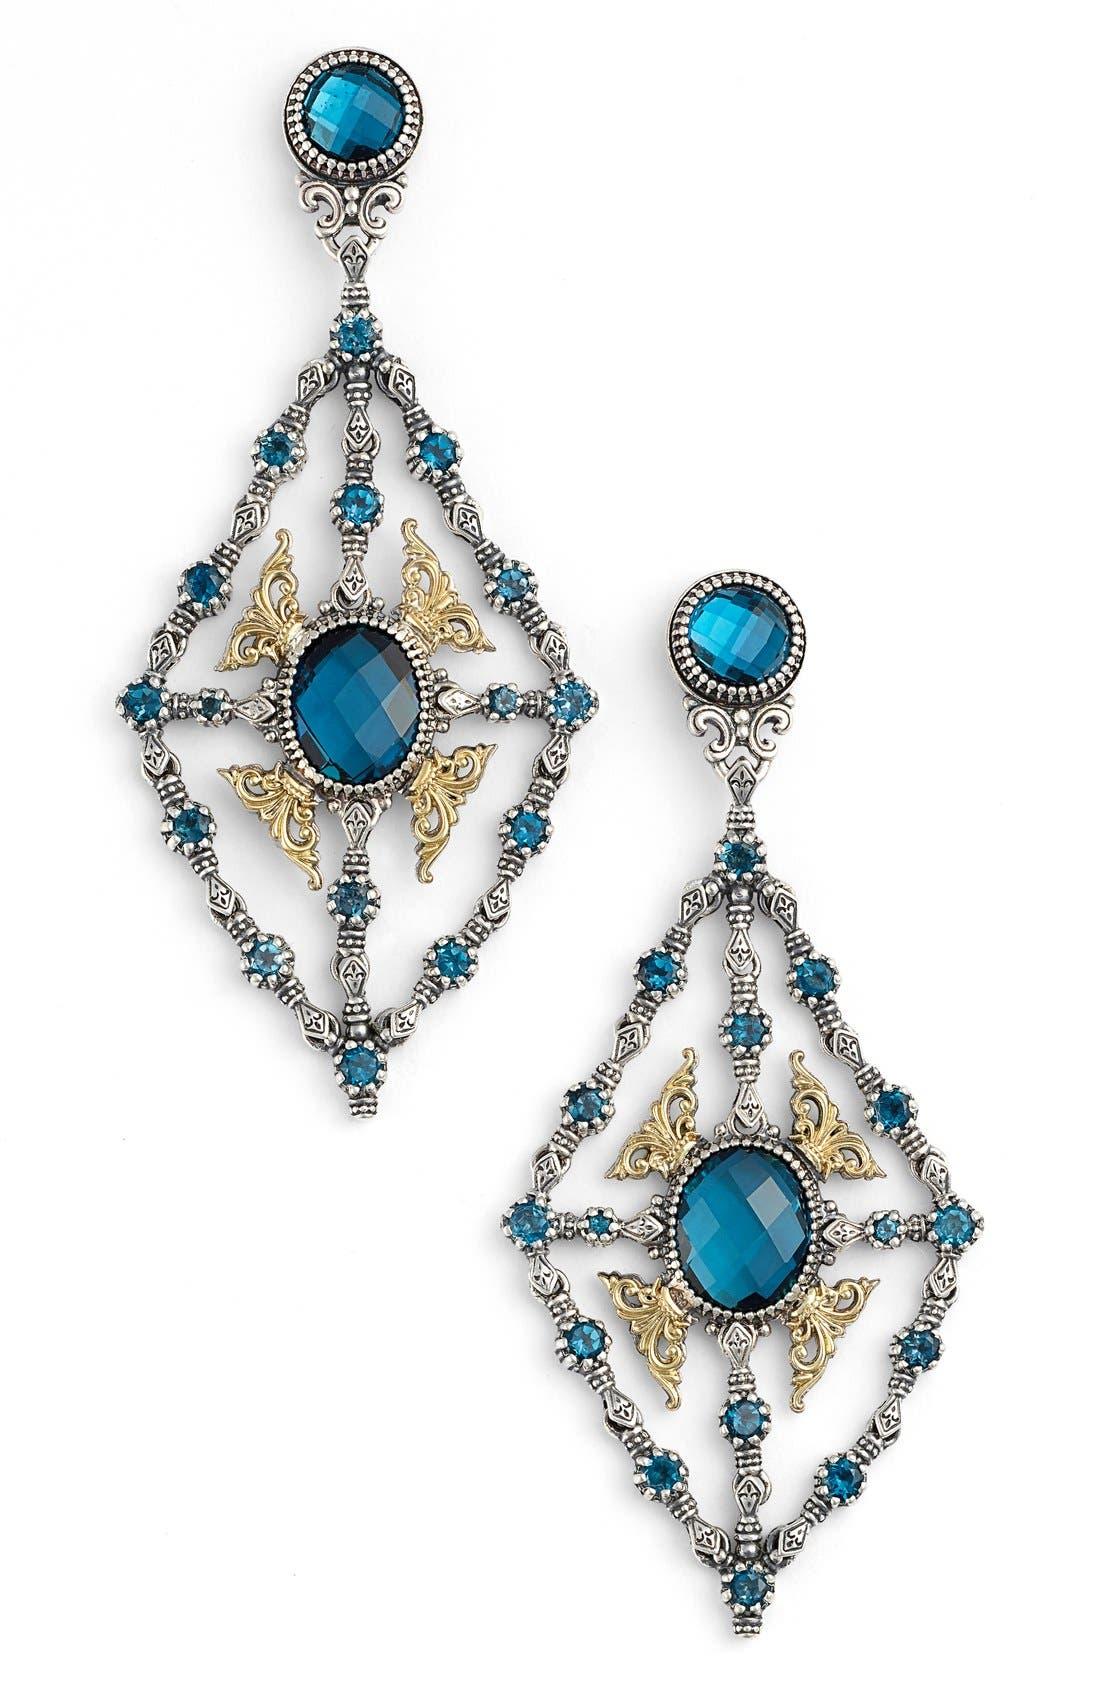 'Thalassa' Blue Topaz Kite Chandelier Earrings,                             Main thumbnail 1, color,                             Silver/ London Blue Topaz